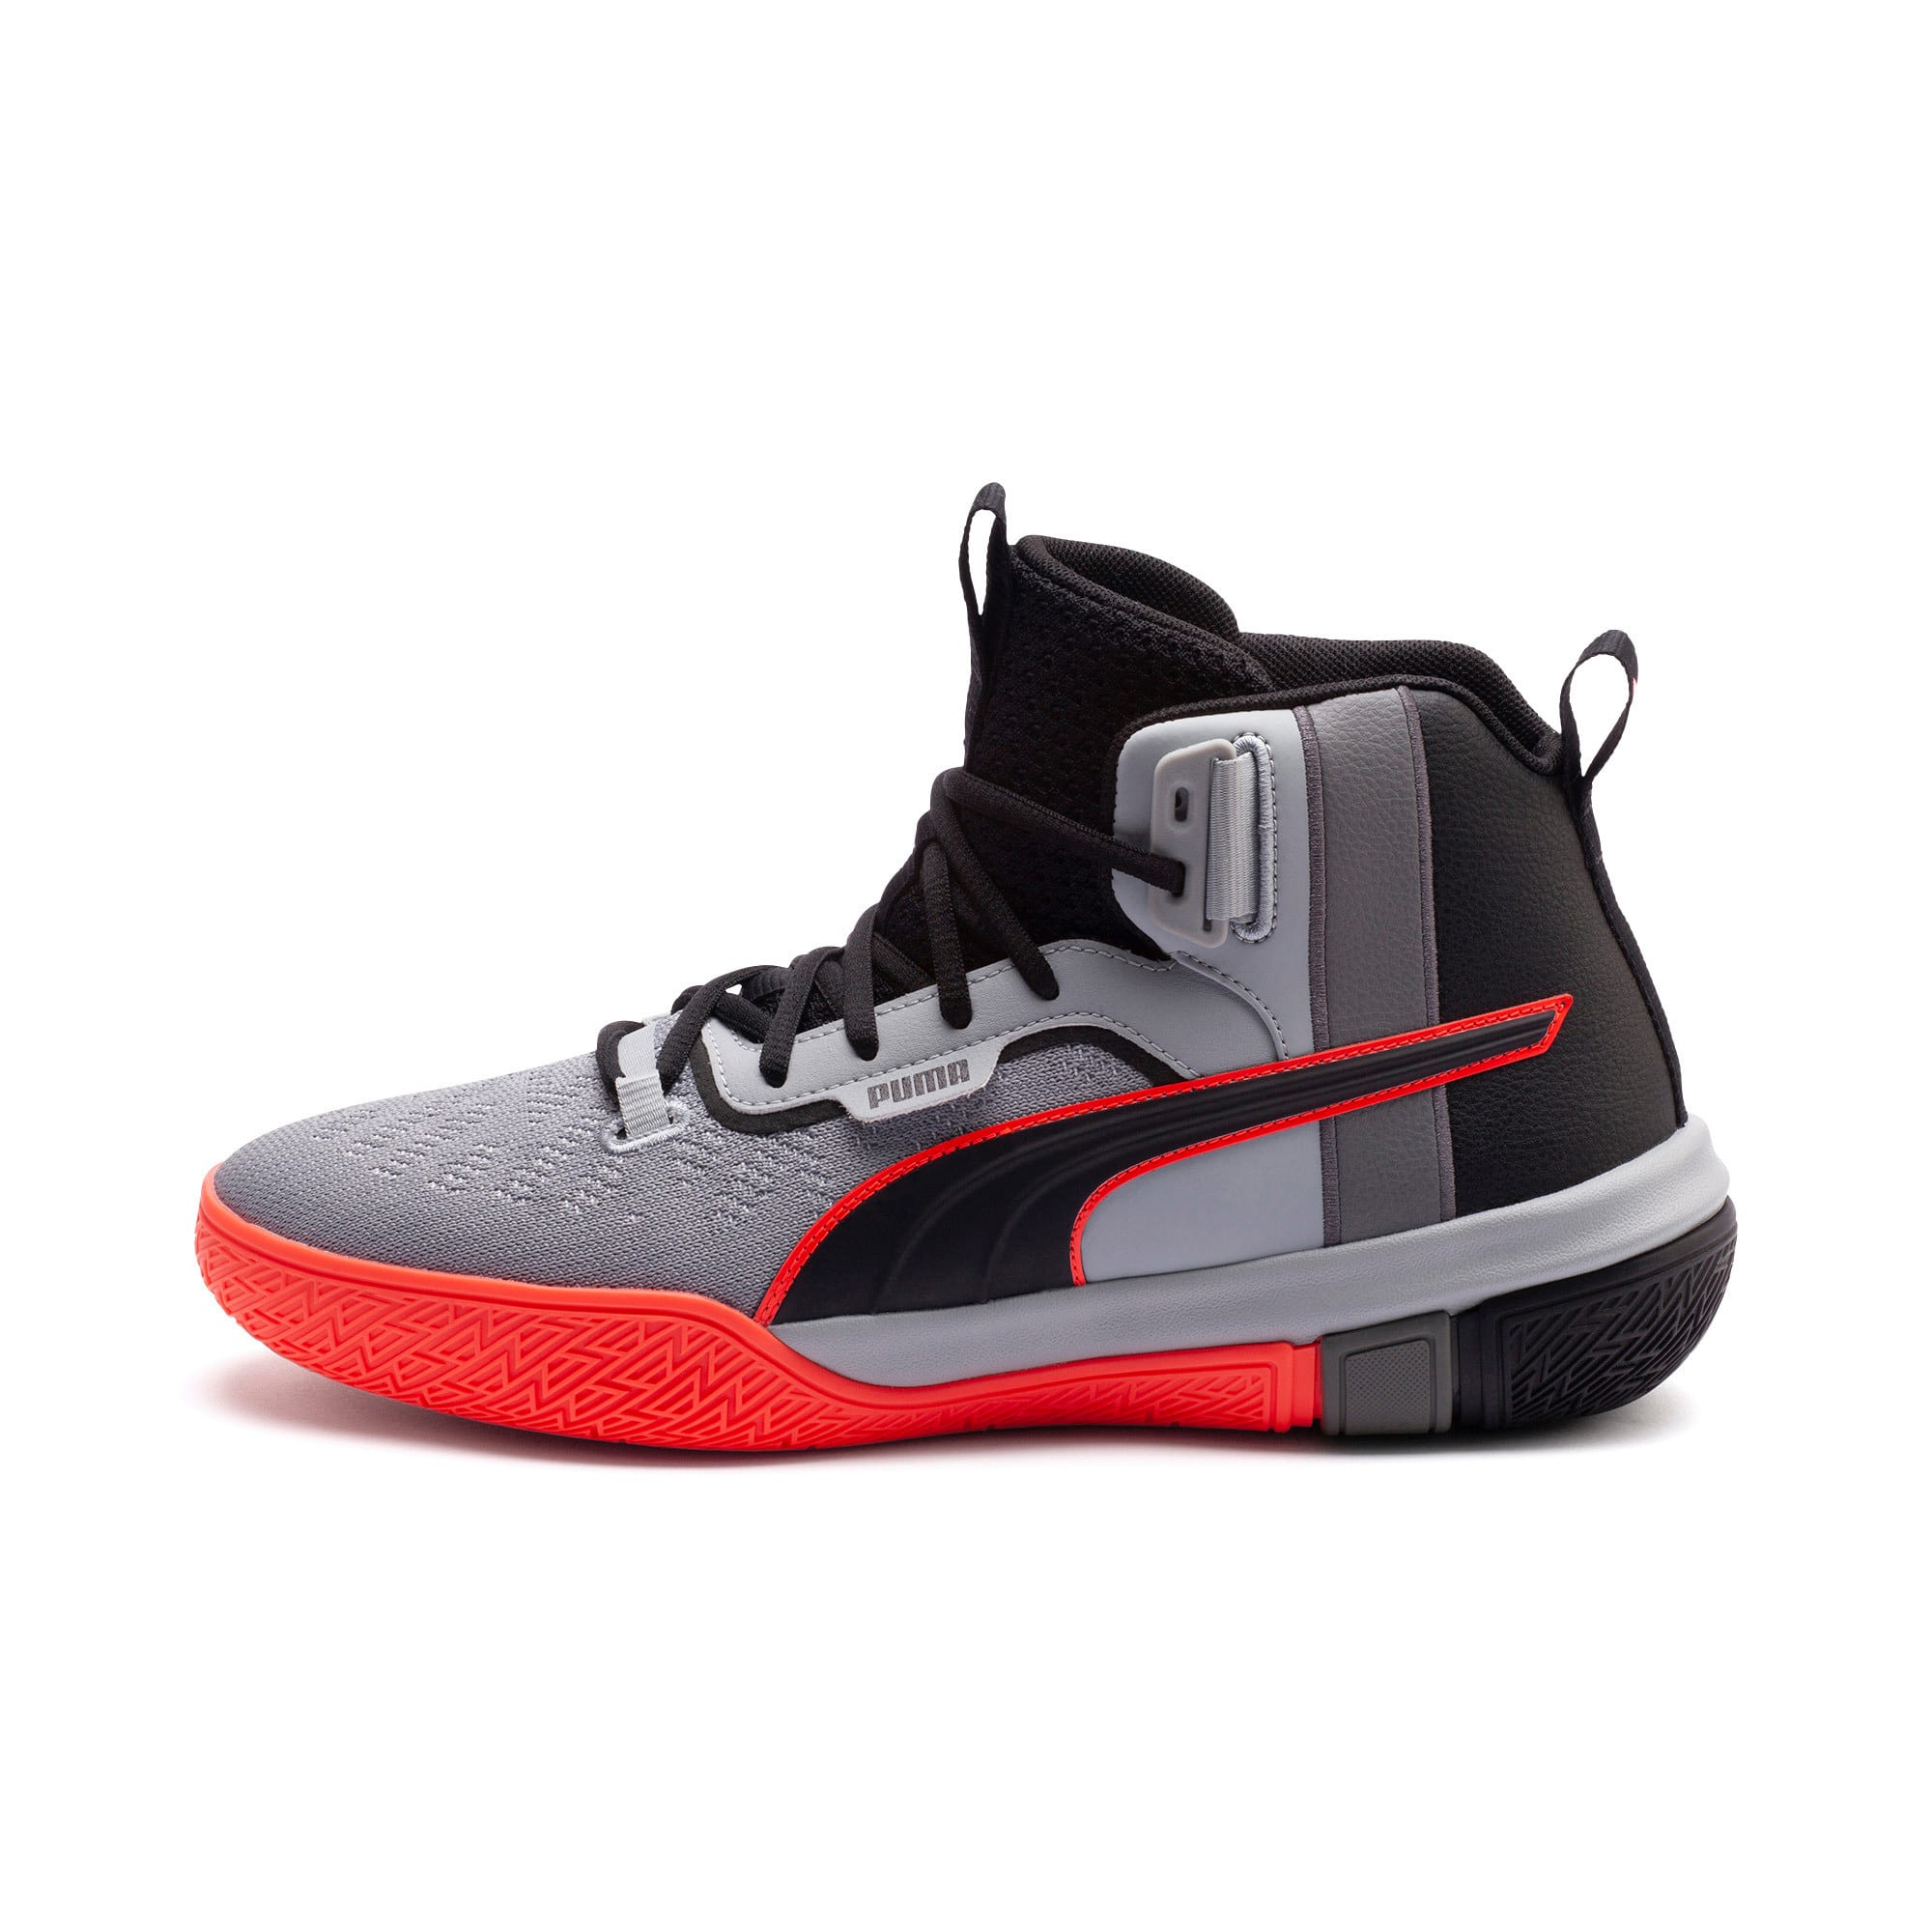 Thumbnail 1 of Legacy Disrupt Men's Basketball Shoes, Puma Black-Red Blast, medium